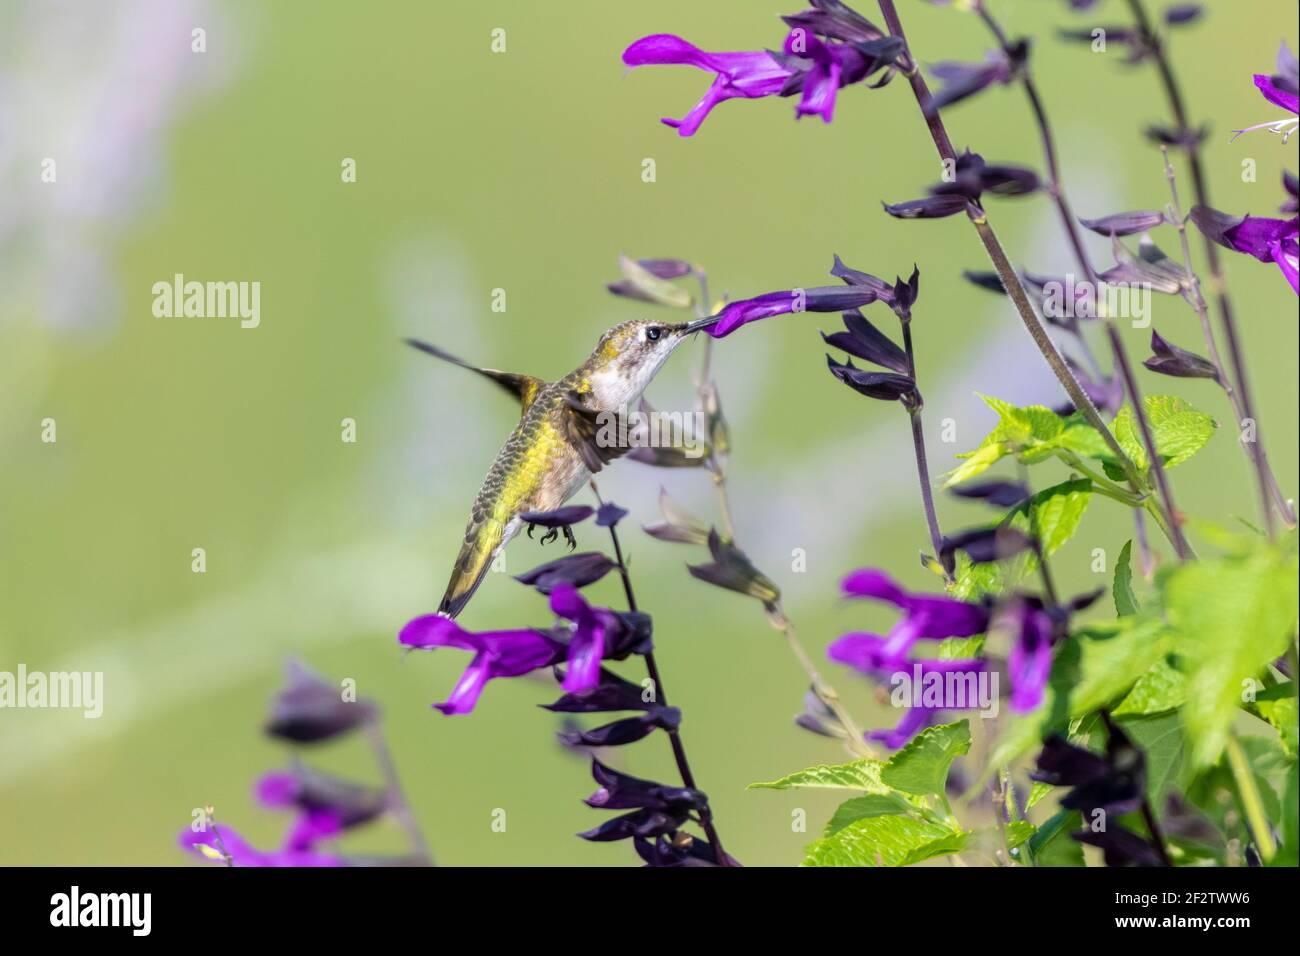 01162-16405 Ruby-throated Hummingbird (Archilochus colubris) at Salvia 'Purple and Bloom' (Salvia guaranitica) Marion Co.  IL Stock Photo